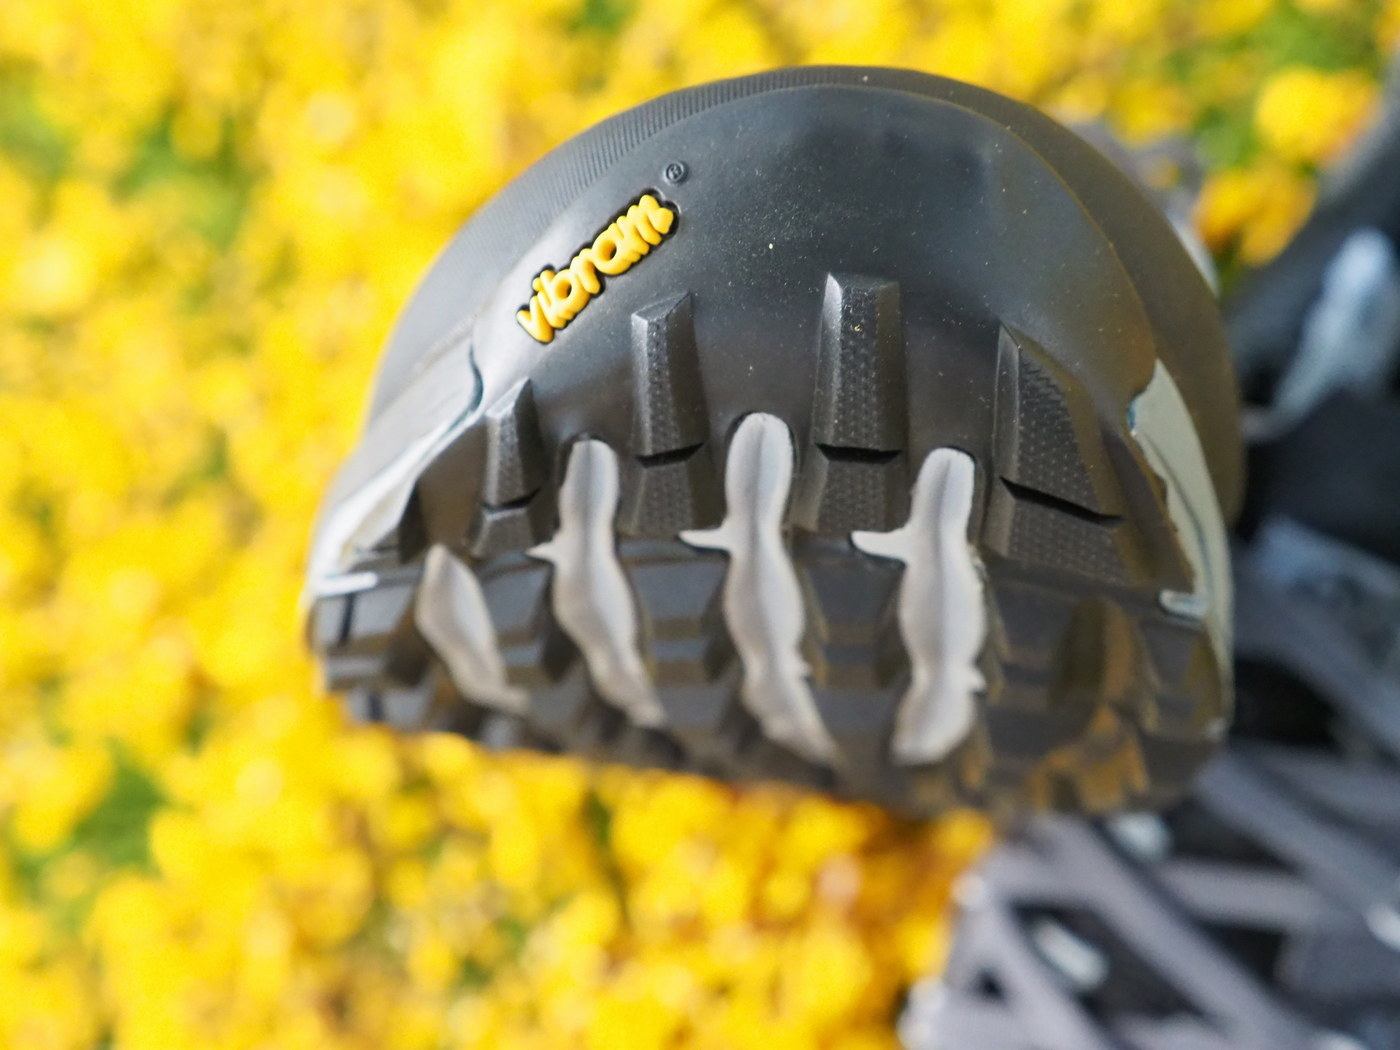 shoe tip